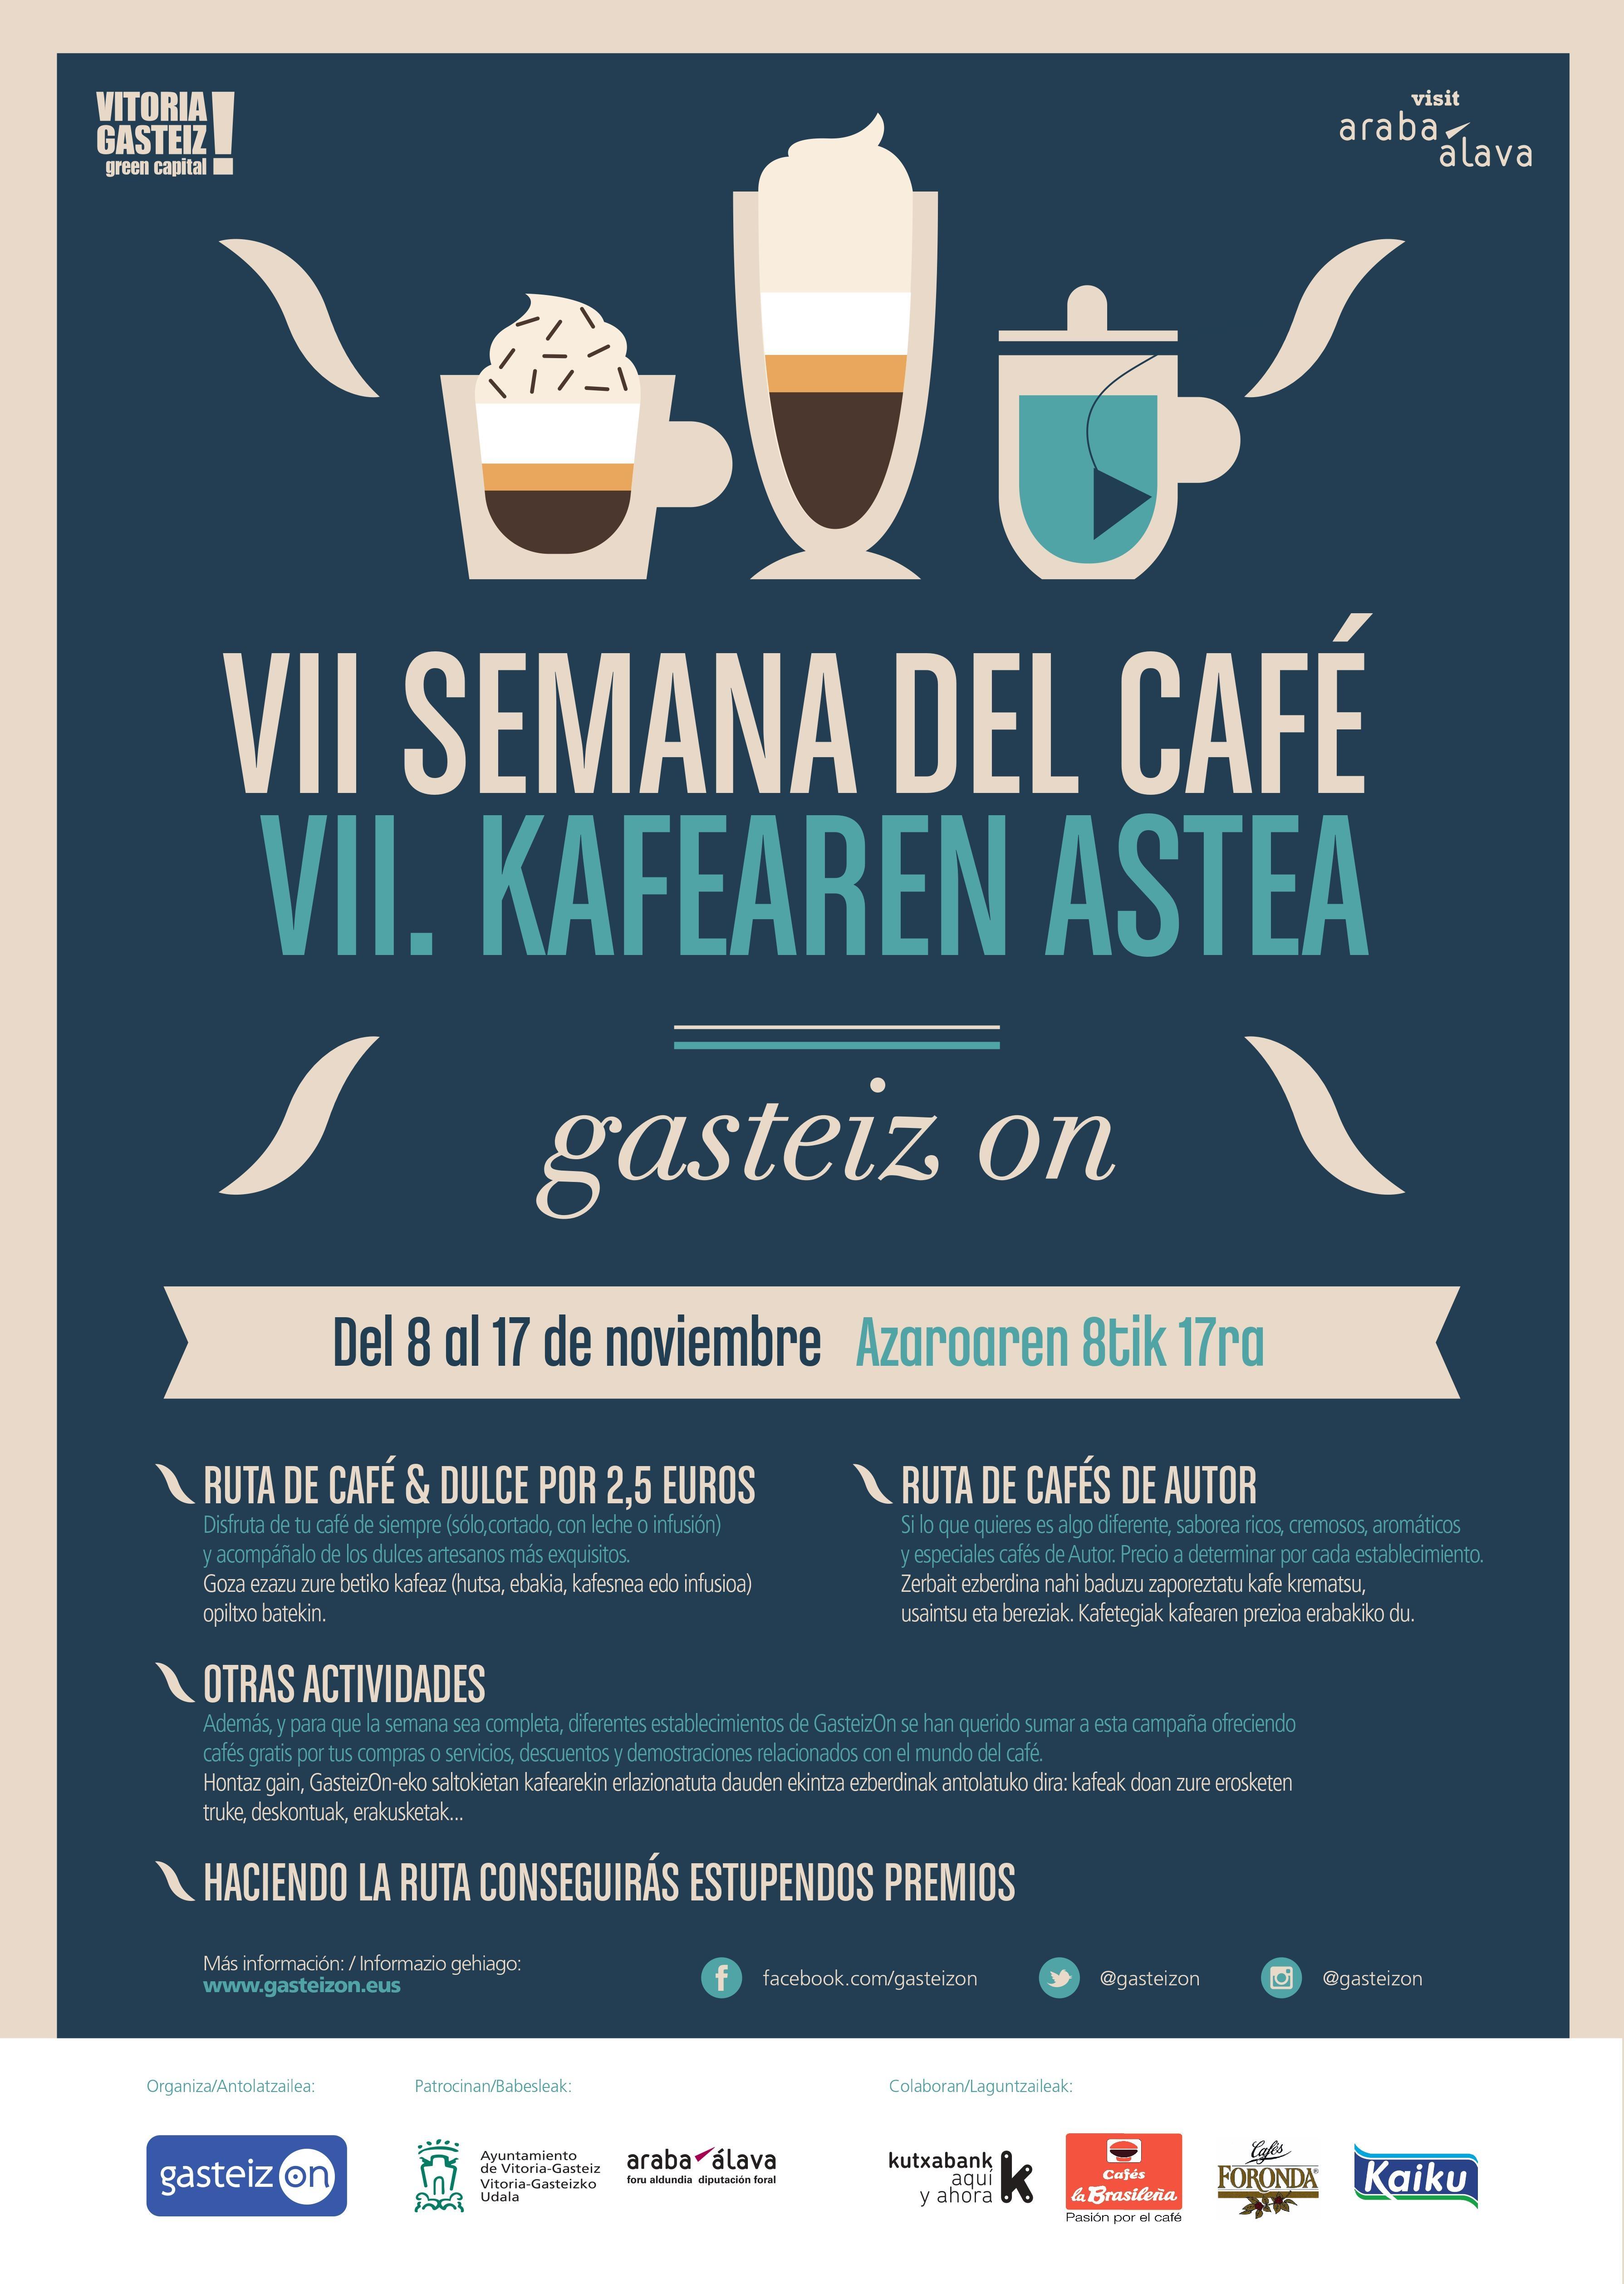 Semana del Café 2019 (del 8 al 17 de noviembre)